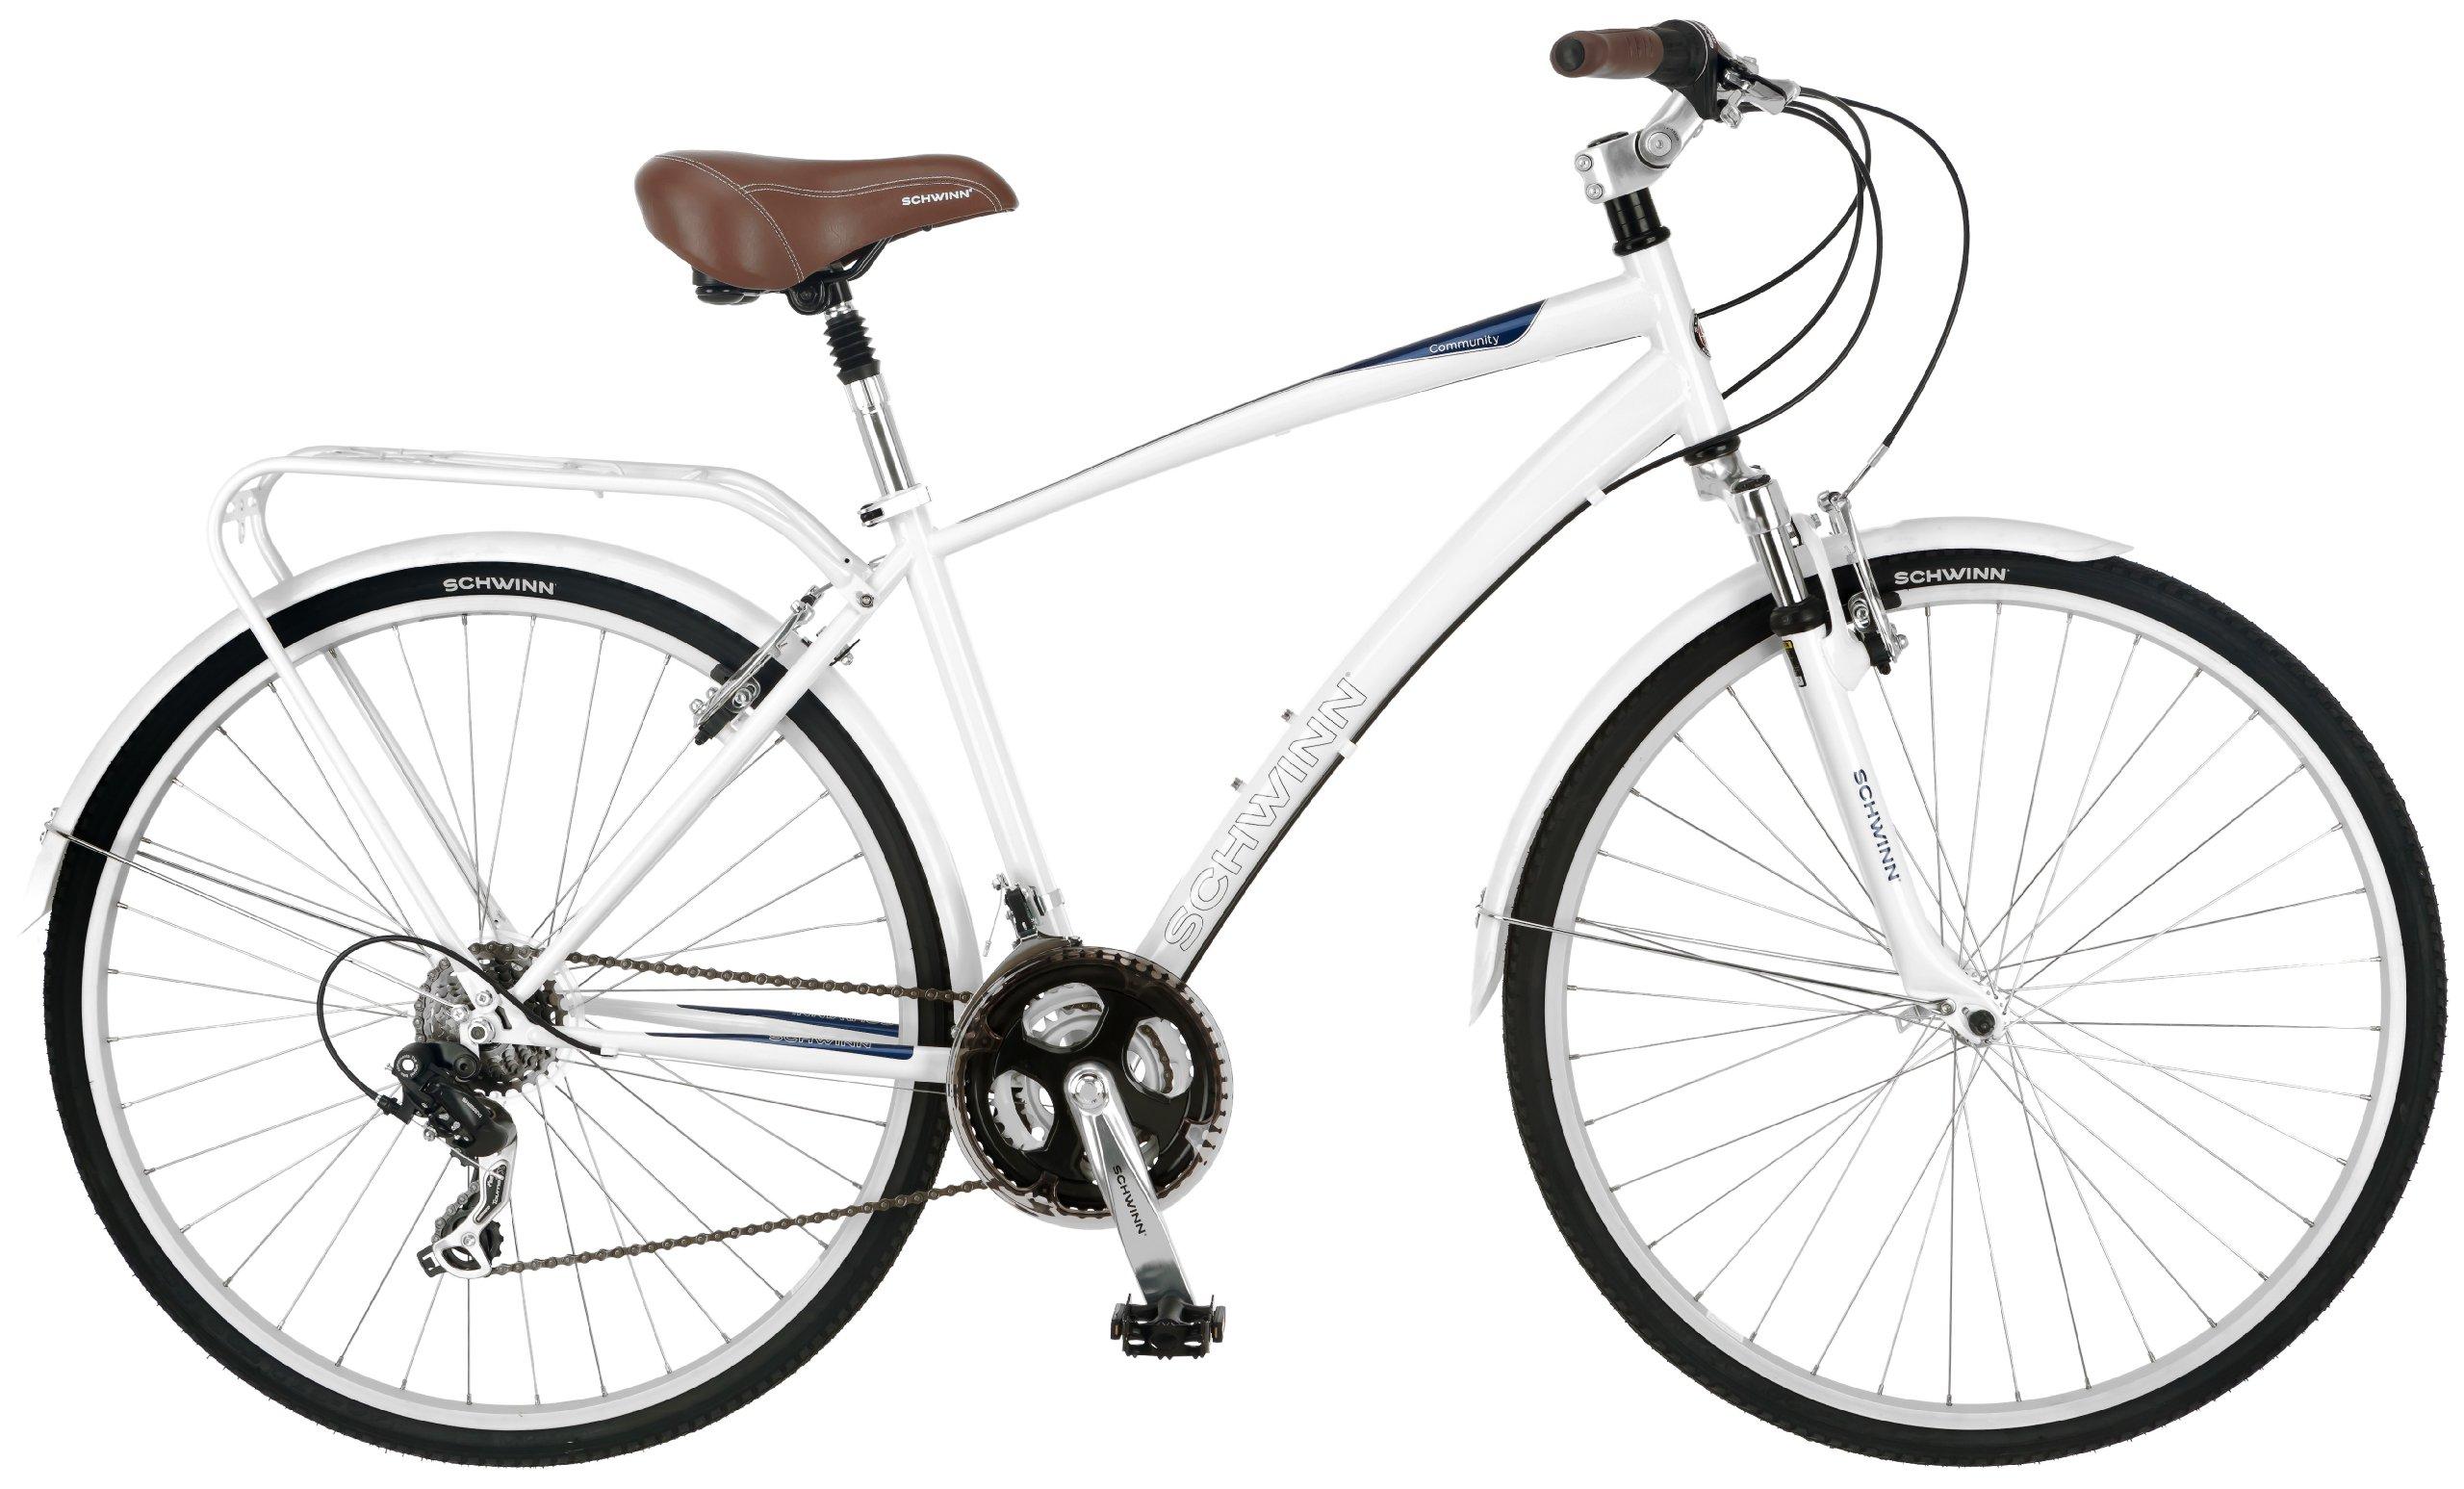 Schwinn Men's Community 700c Hybrid Bicycle, White, 18-Inch Frame by Schwinn (Image #1)